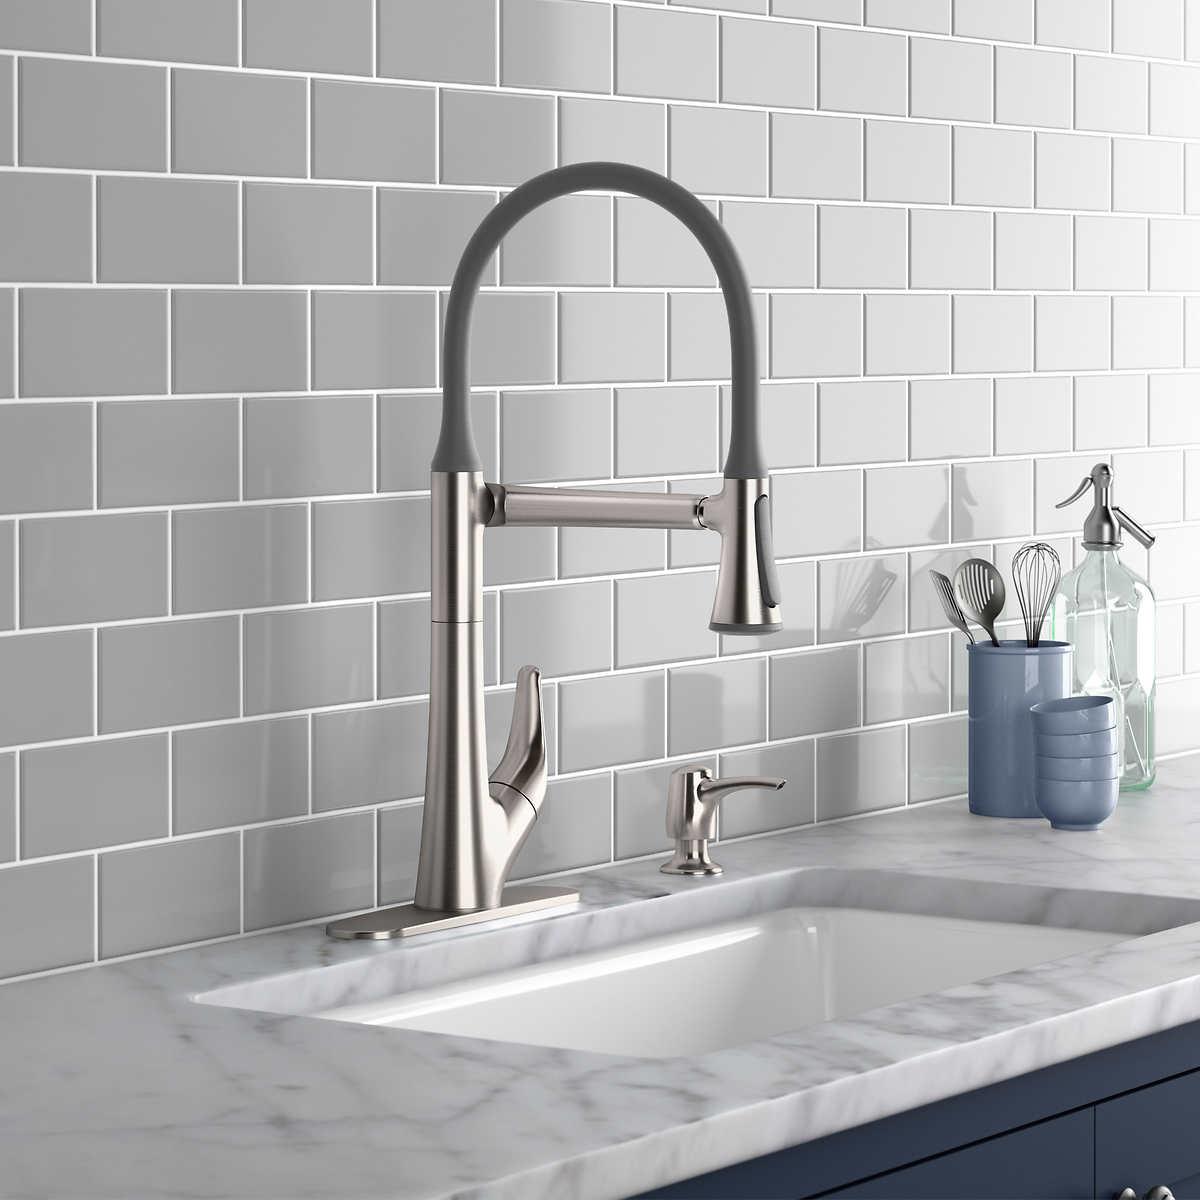 Kohler Arise Pull Down Kitchen Faucet